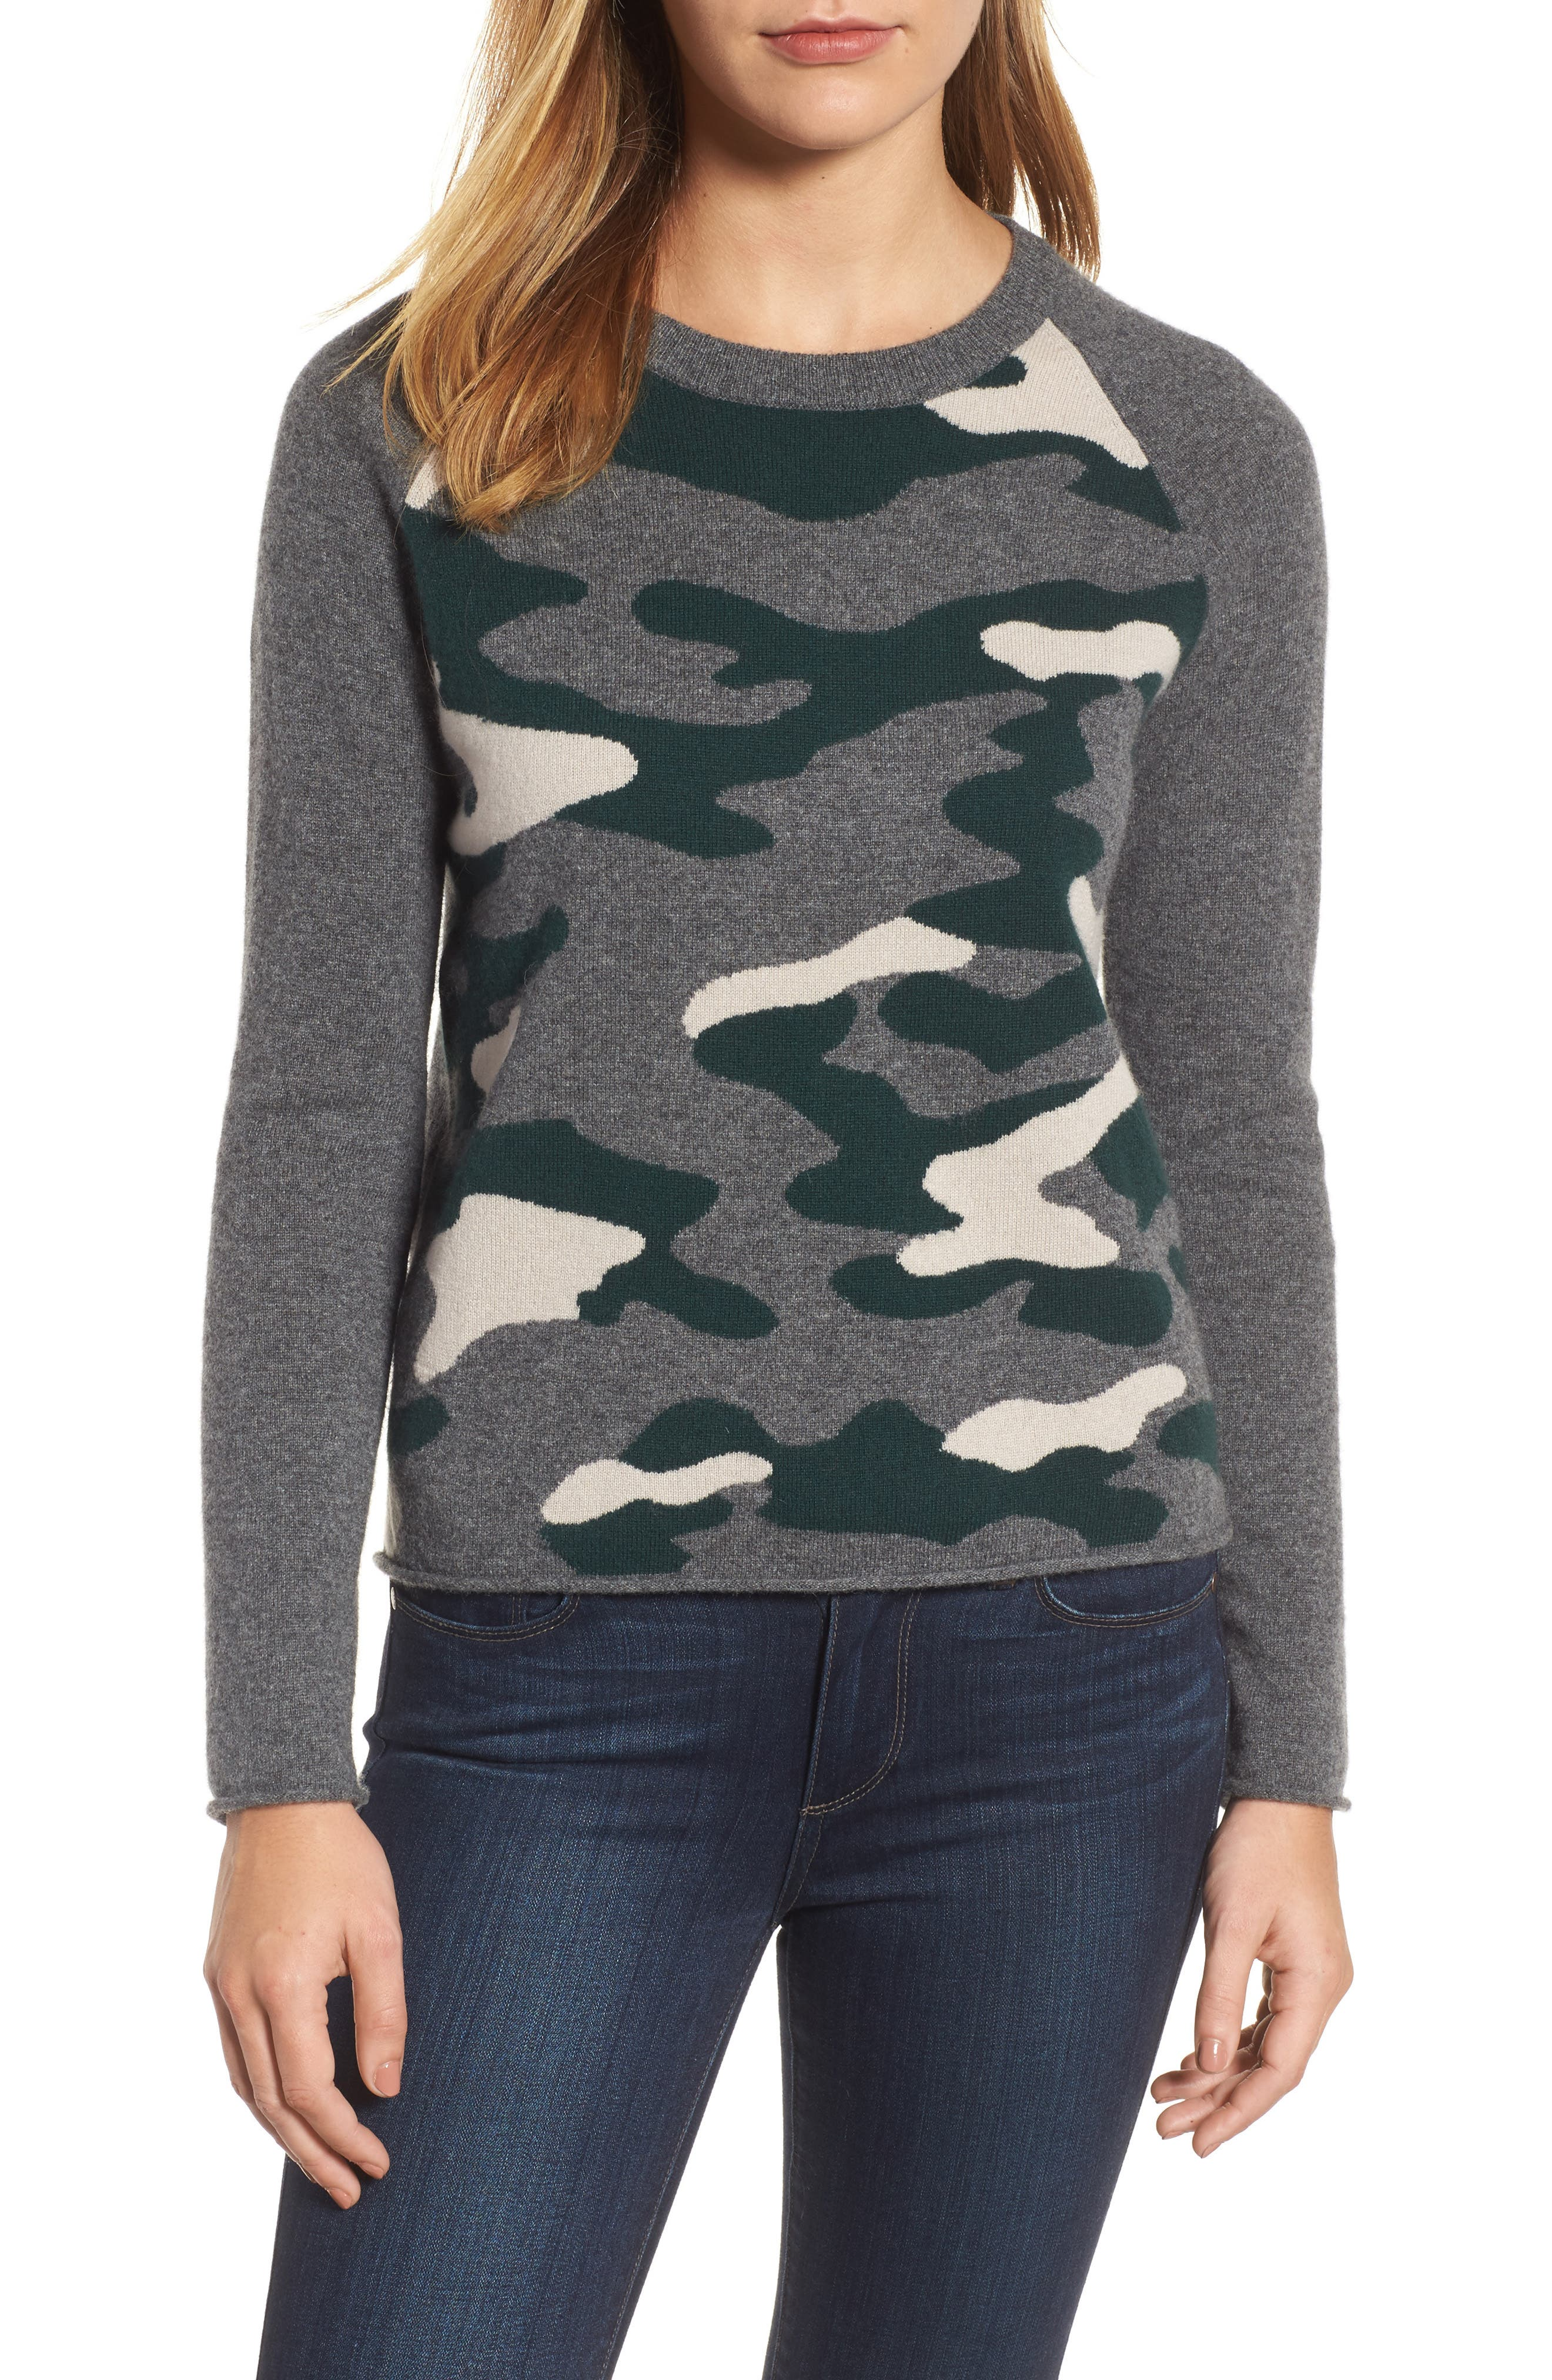 Camo Cashmere Sweater,                             Main thumbnail 1, color,                             Multi